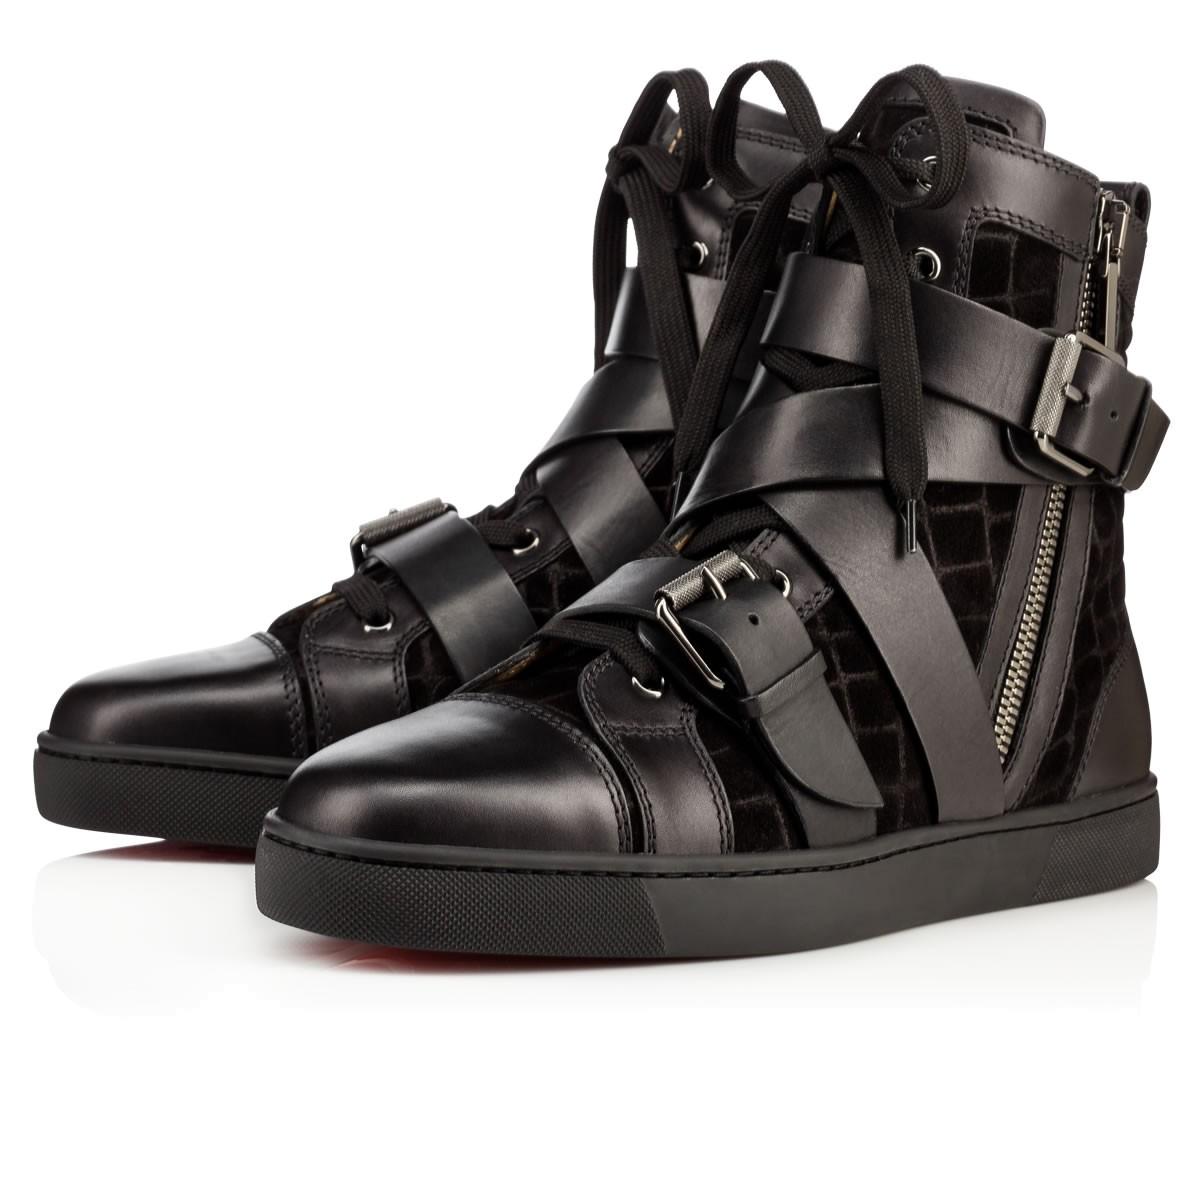 tout neuf 77c6c b55cf Snap Shoot Calf/Crosta Dundee Black Veau Velours - Men Shoes - Christian  Louboutin